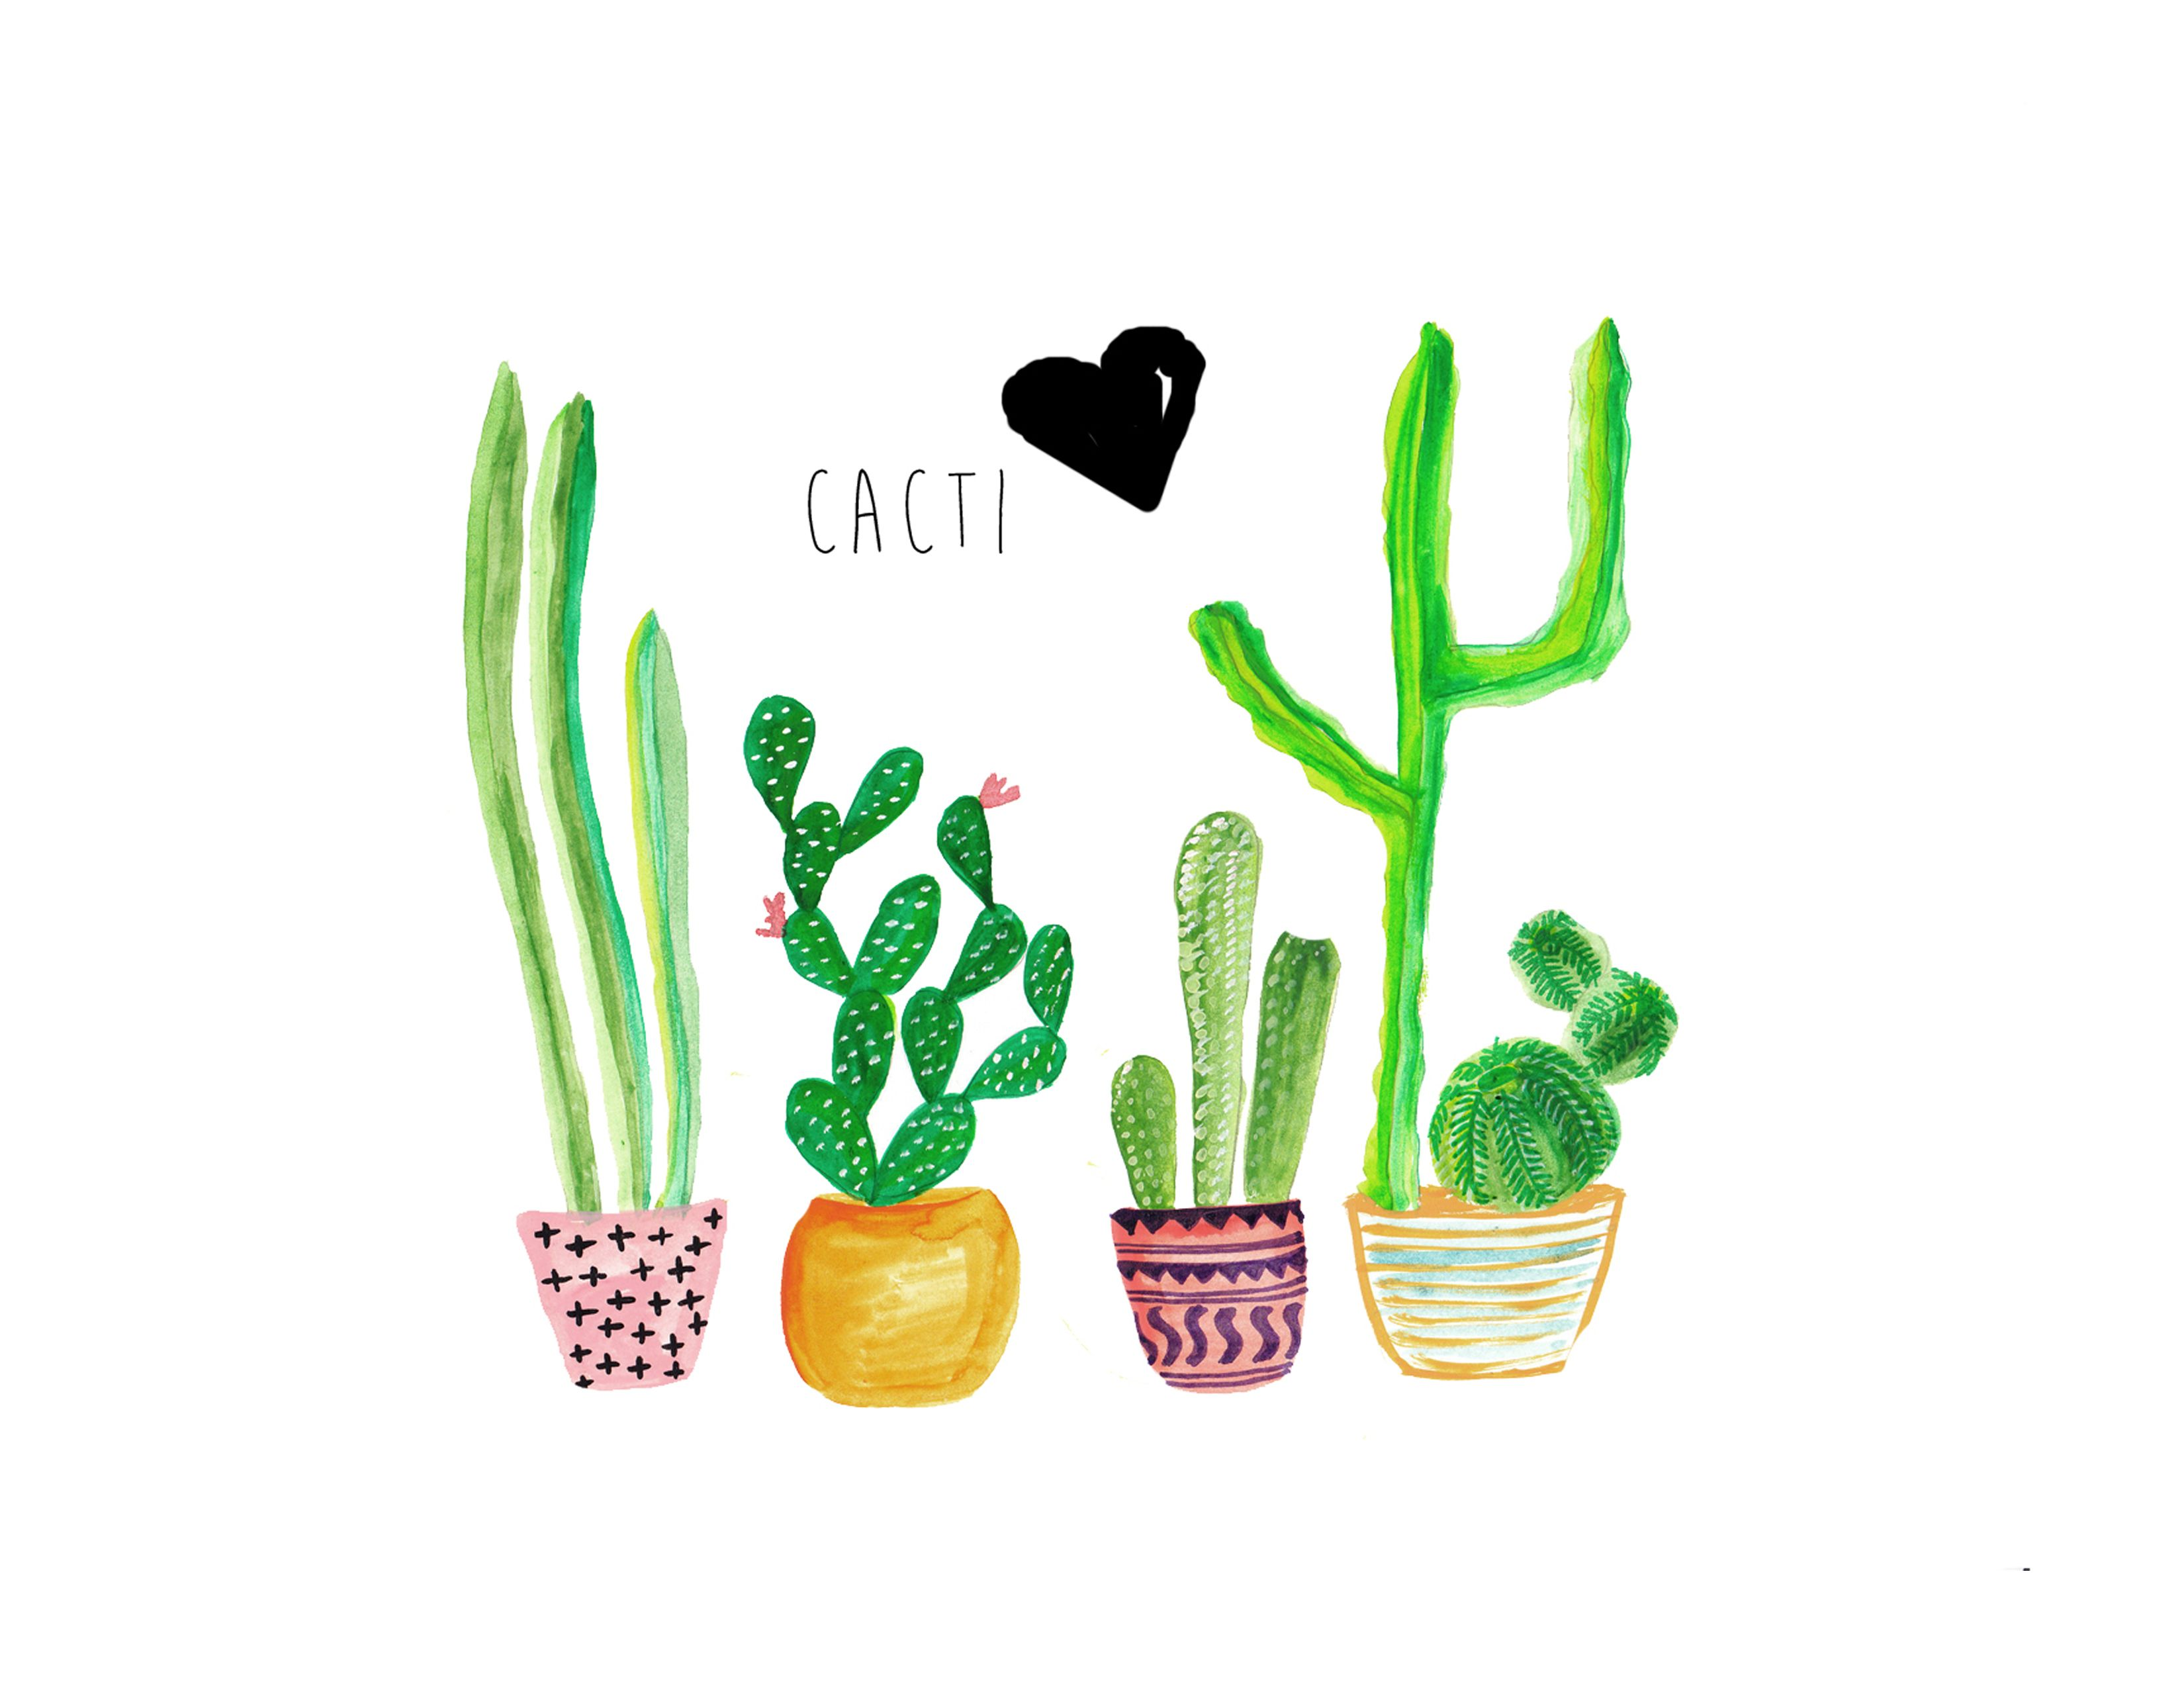 Cacti Artprint 1 Jpg 3300 2550 Cactus Backgrounds Cute